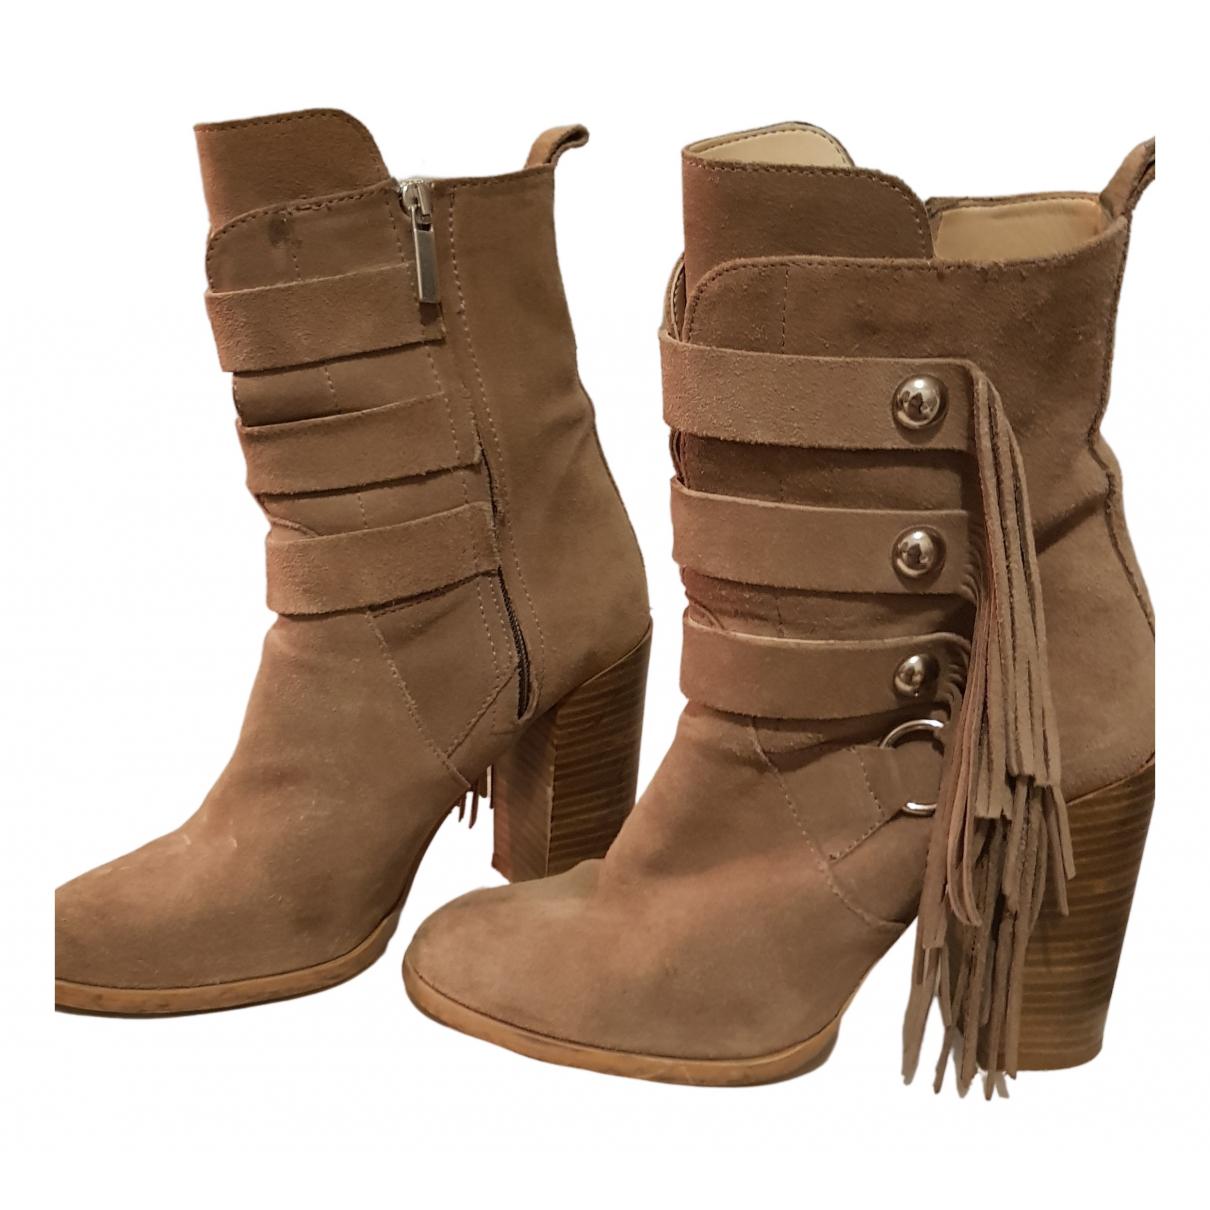 Zara N Beige Leather Ankle boots for Women 38 EU